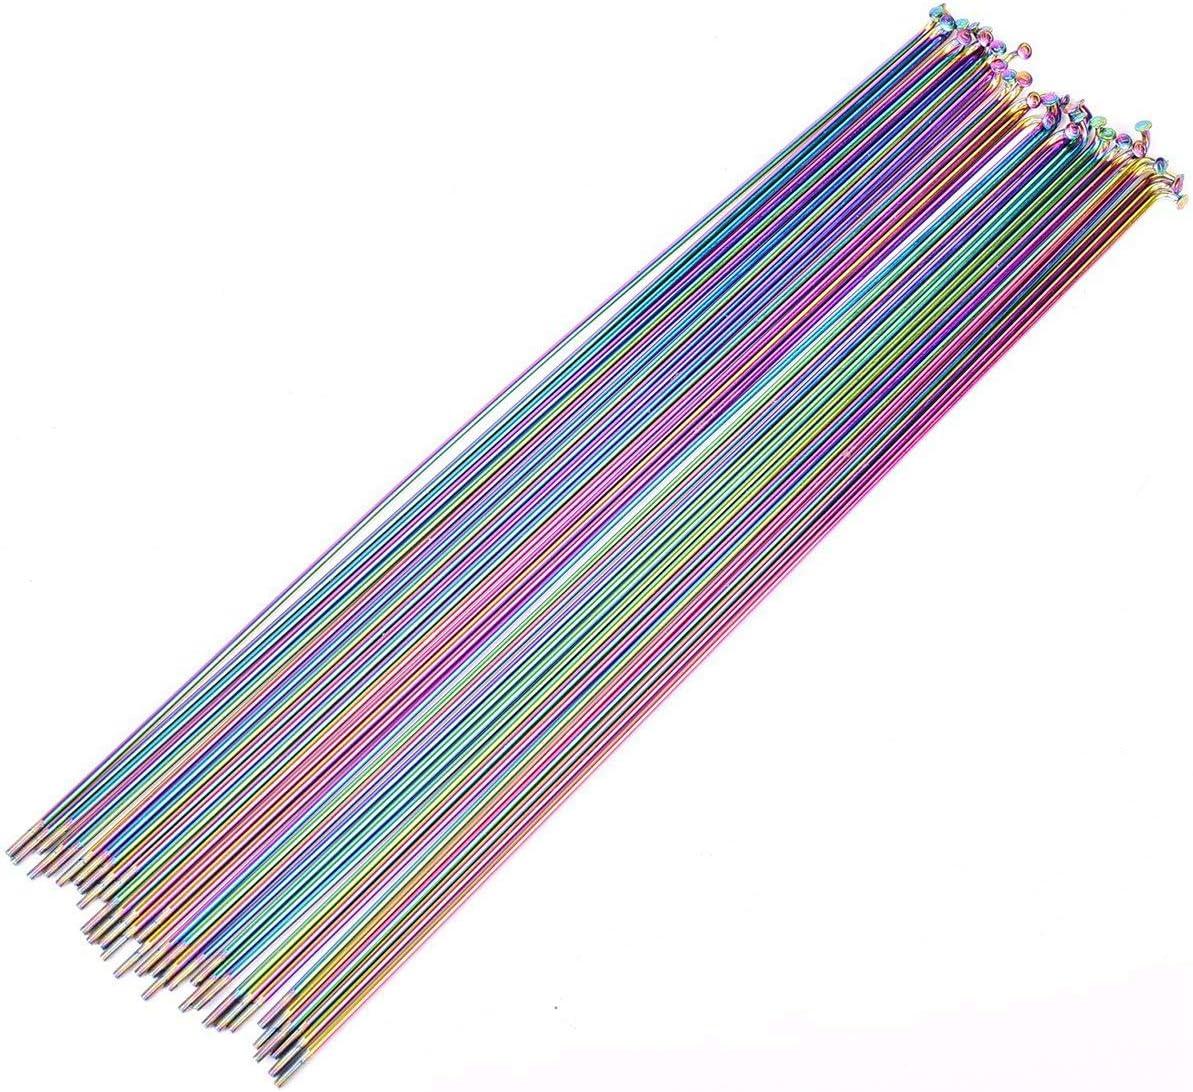 PQZATX 10Pcs Bicycle Spoke Wire Vacuum Plating Rainbow Spokes MTB 261mm